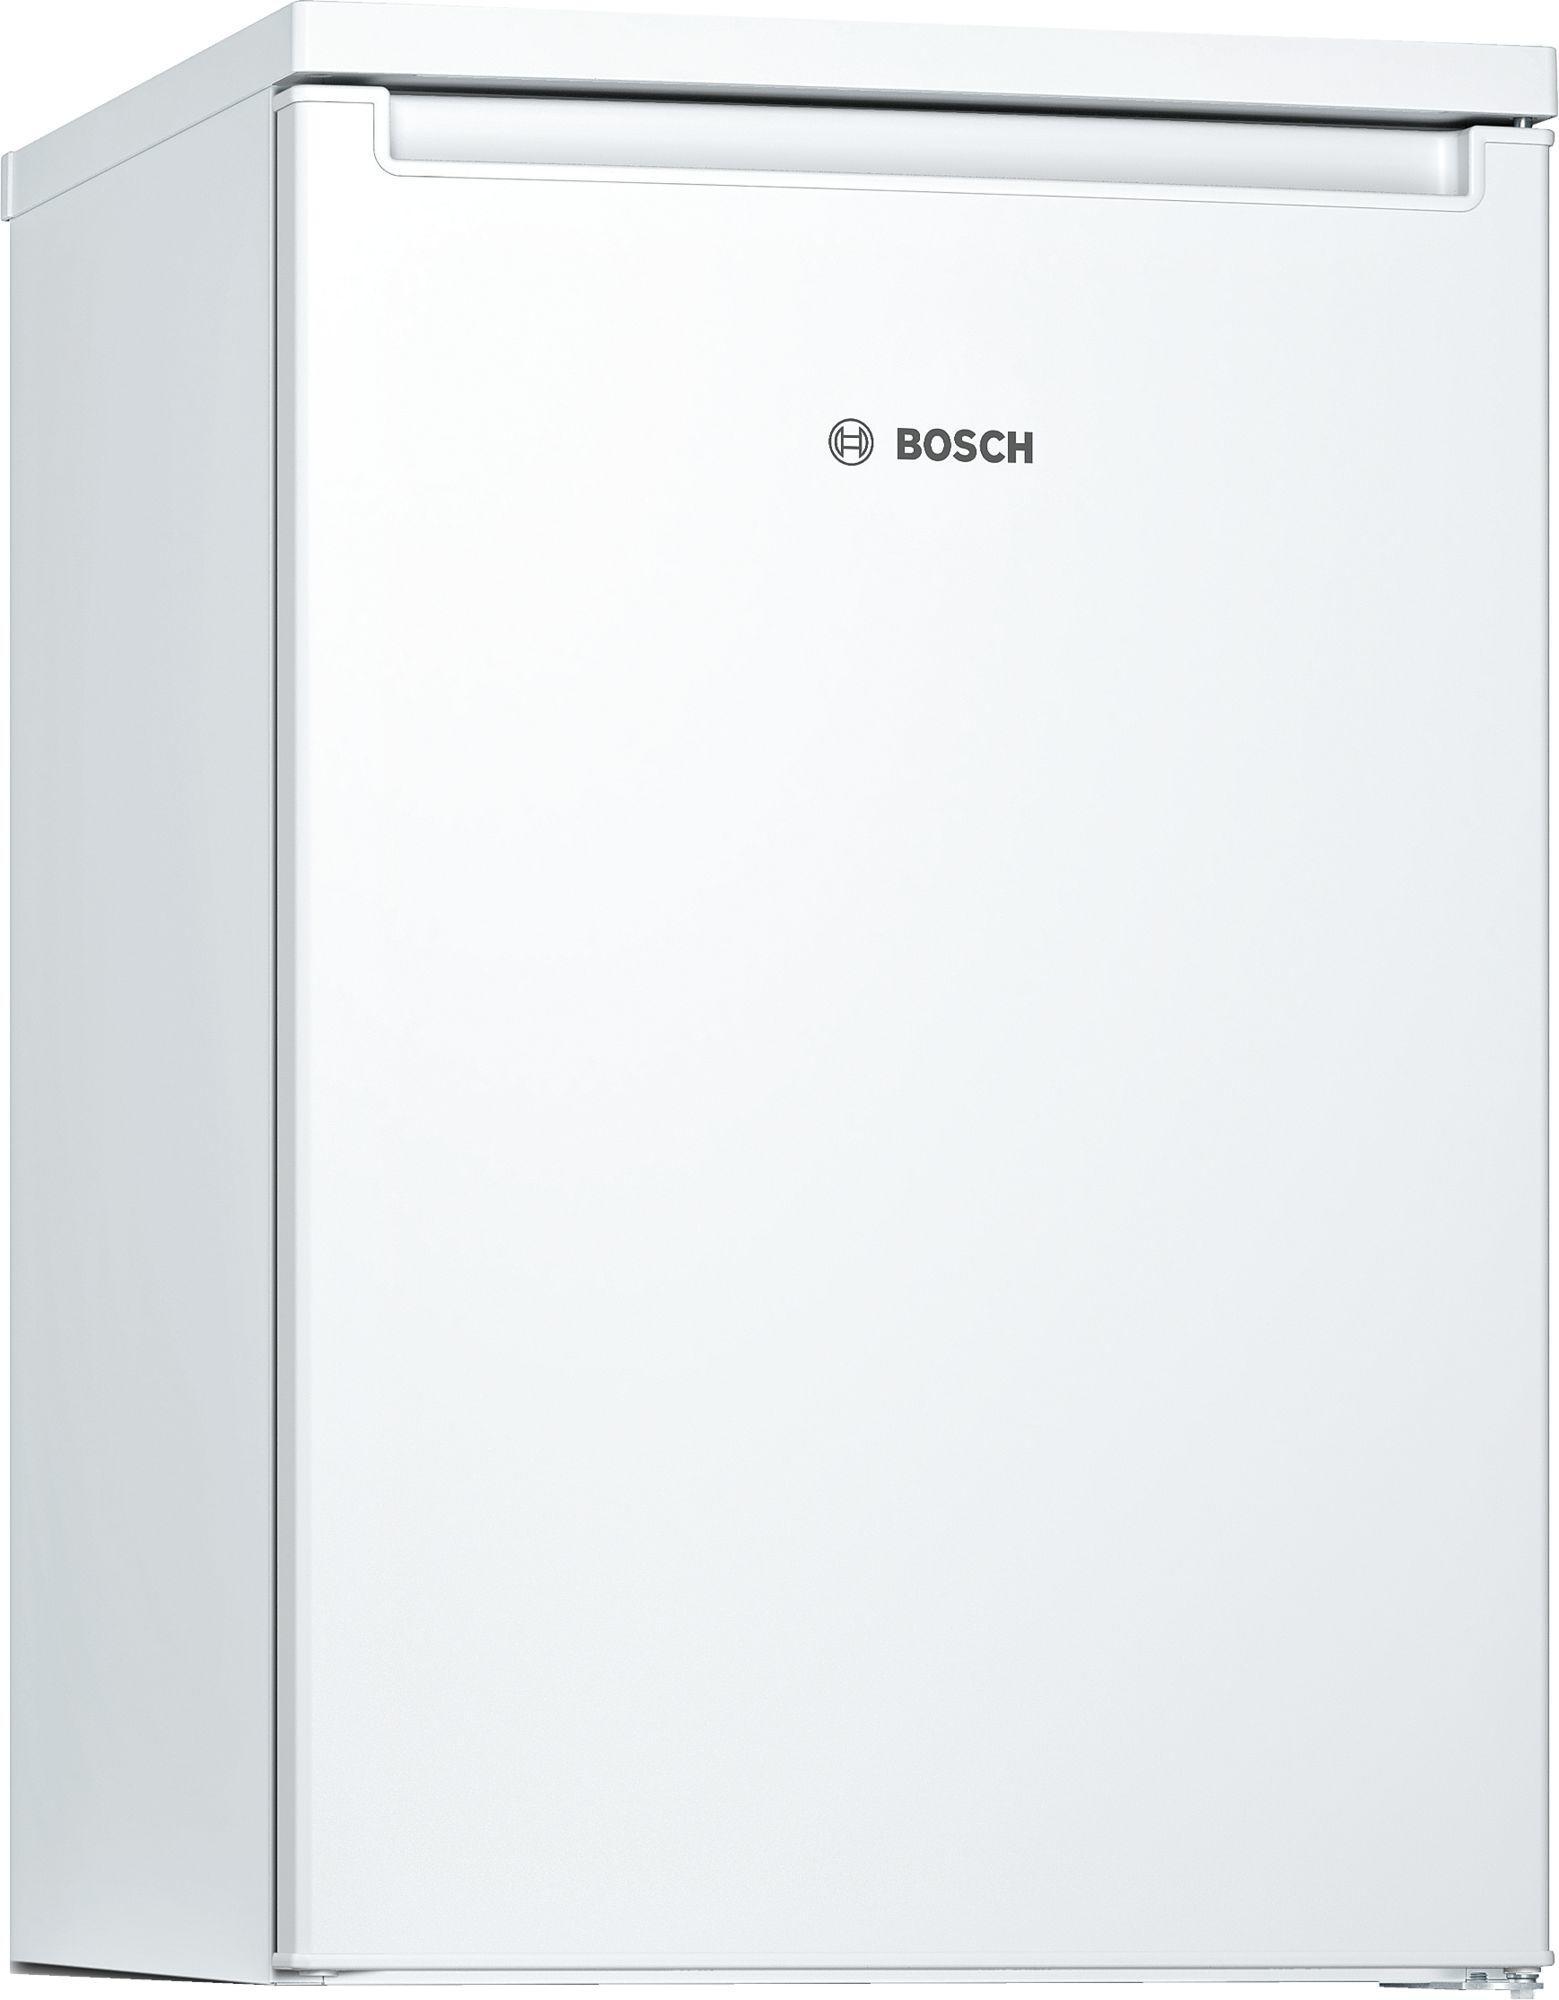 Image of Serie 2 KTR15NWFAG 56cm 135 Litre A++ Single Door Undercounter Fridge | White